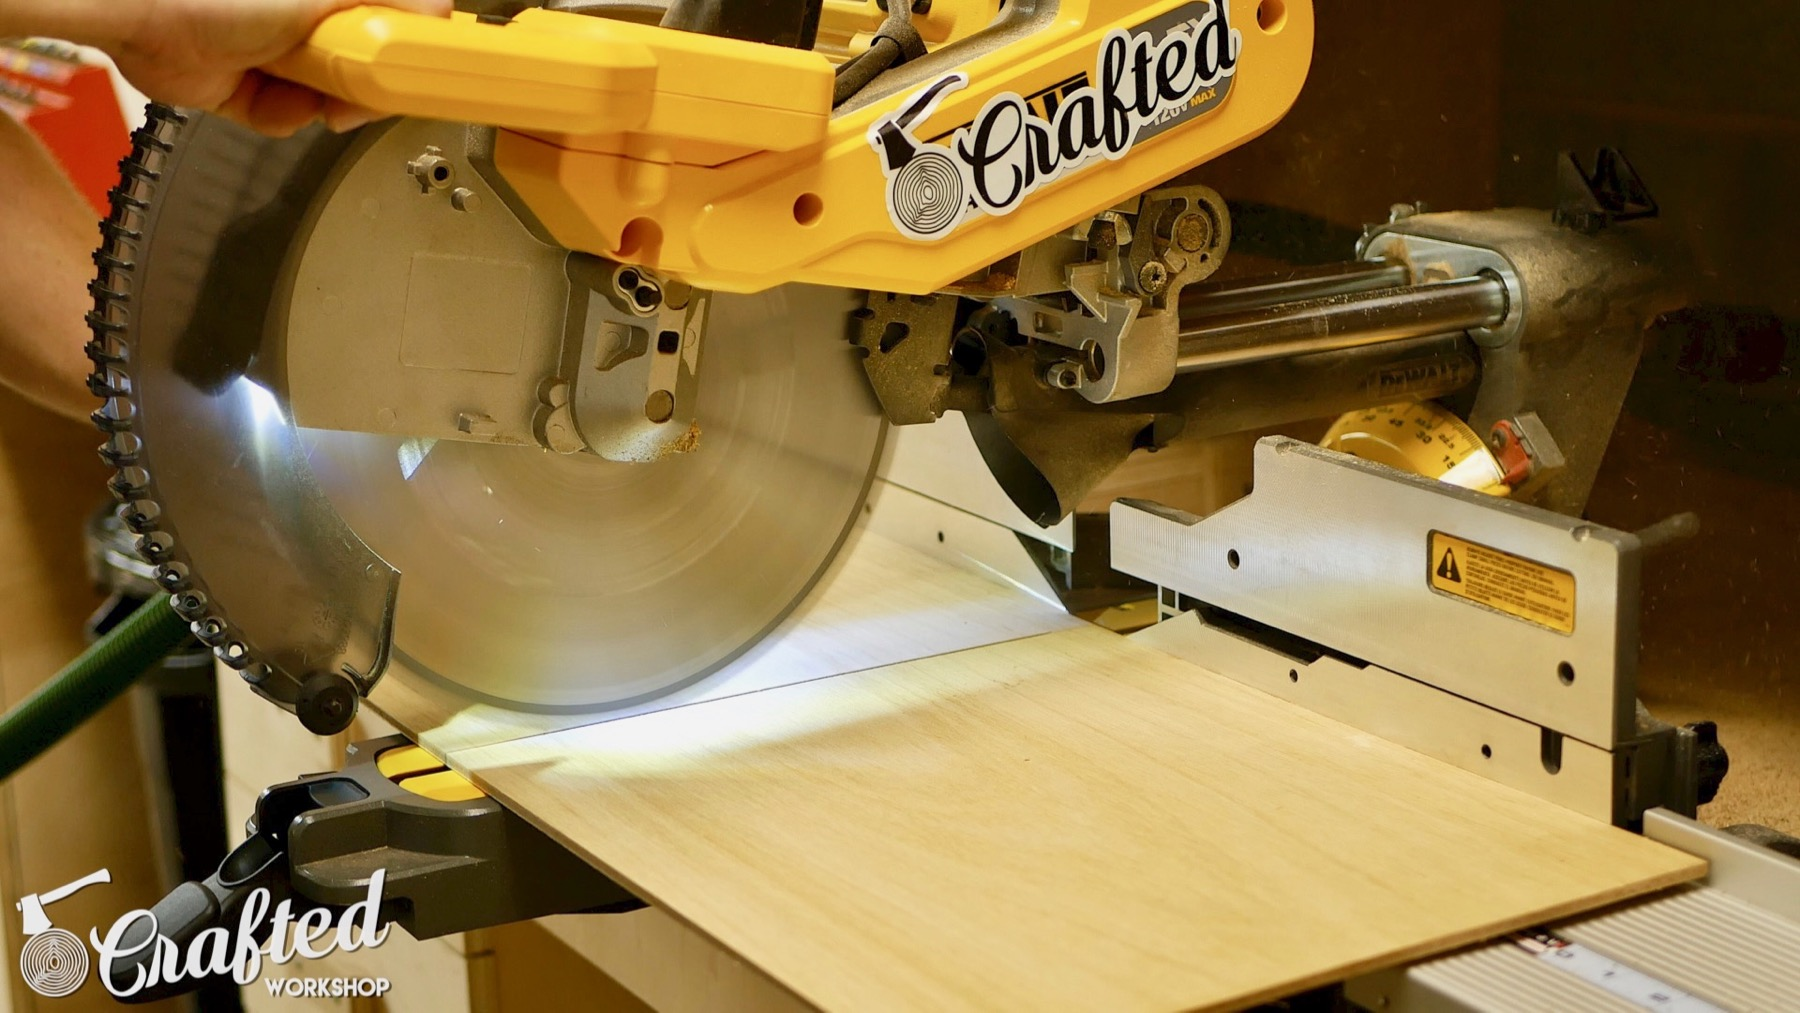 DIY Light Box Sign How-To Build dewalt flexvolt miter saw